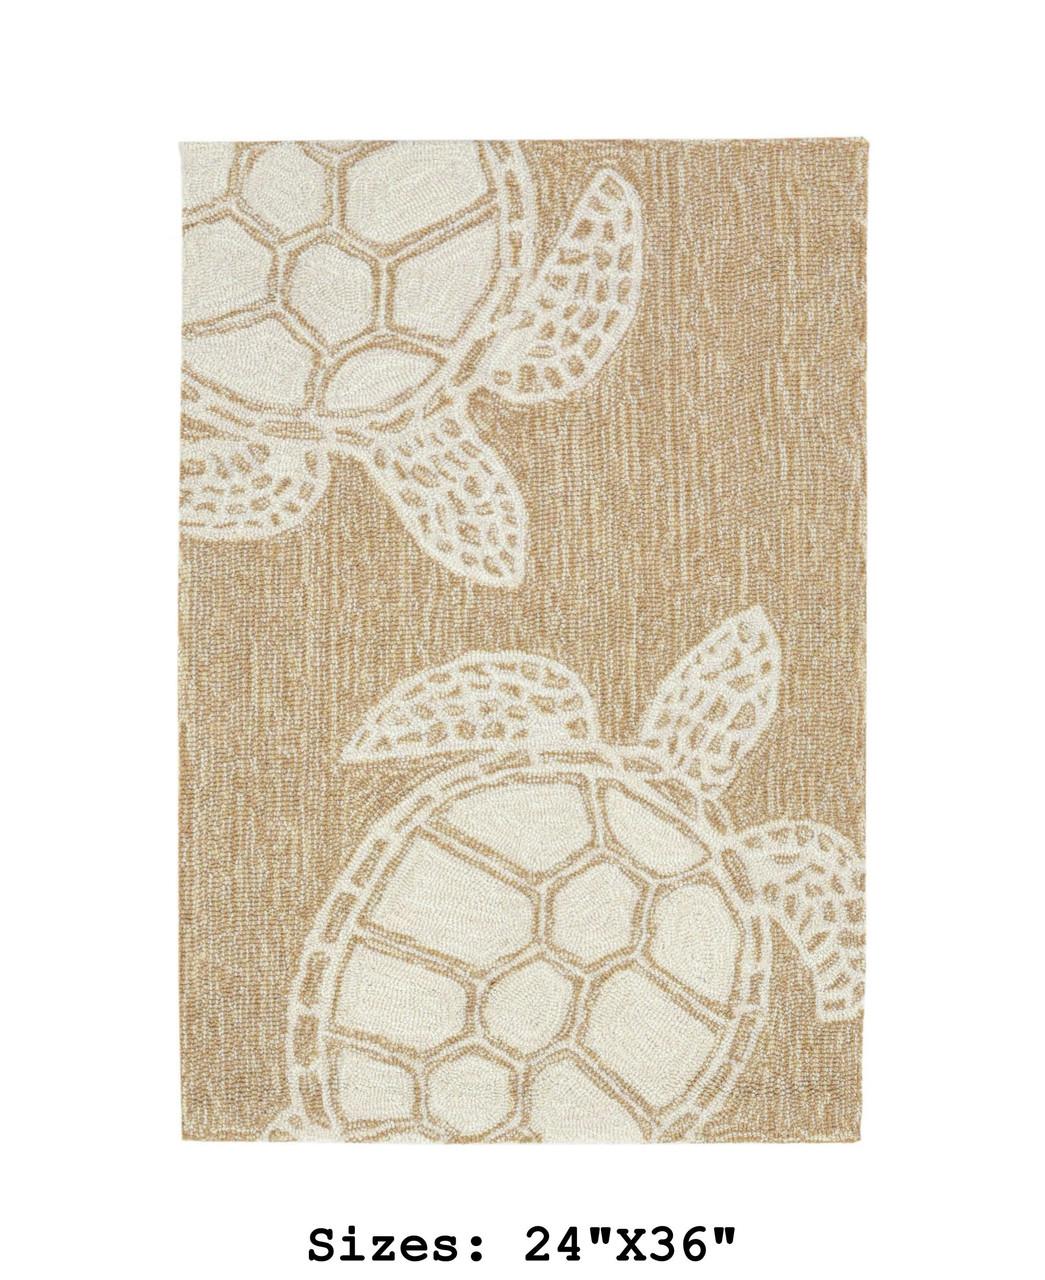 Capri Turtle Indoor/Outdoor Rug - Neutral - Small Rectangle